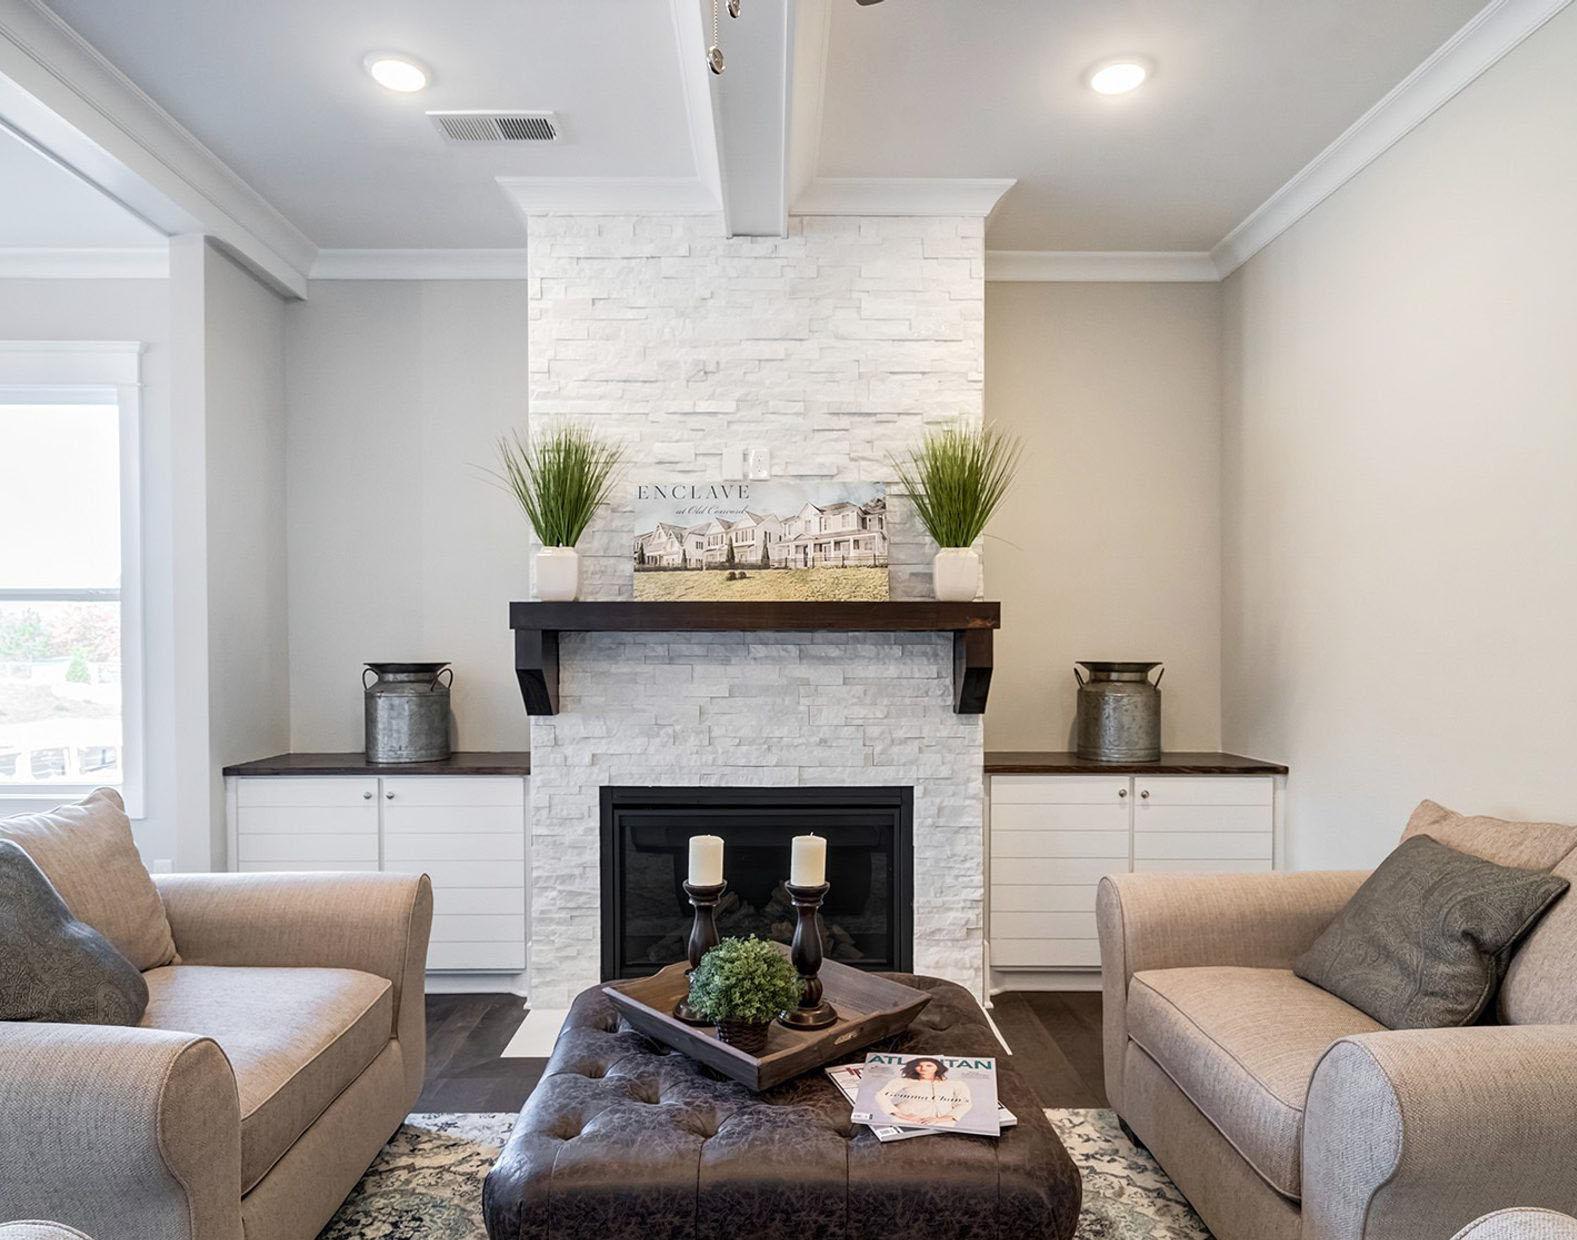 Modern fireplace design using white ledgestone, a black gas firebox and dark wood shelf. fireplace design ideas.